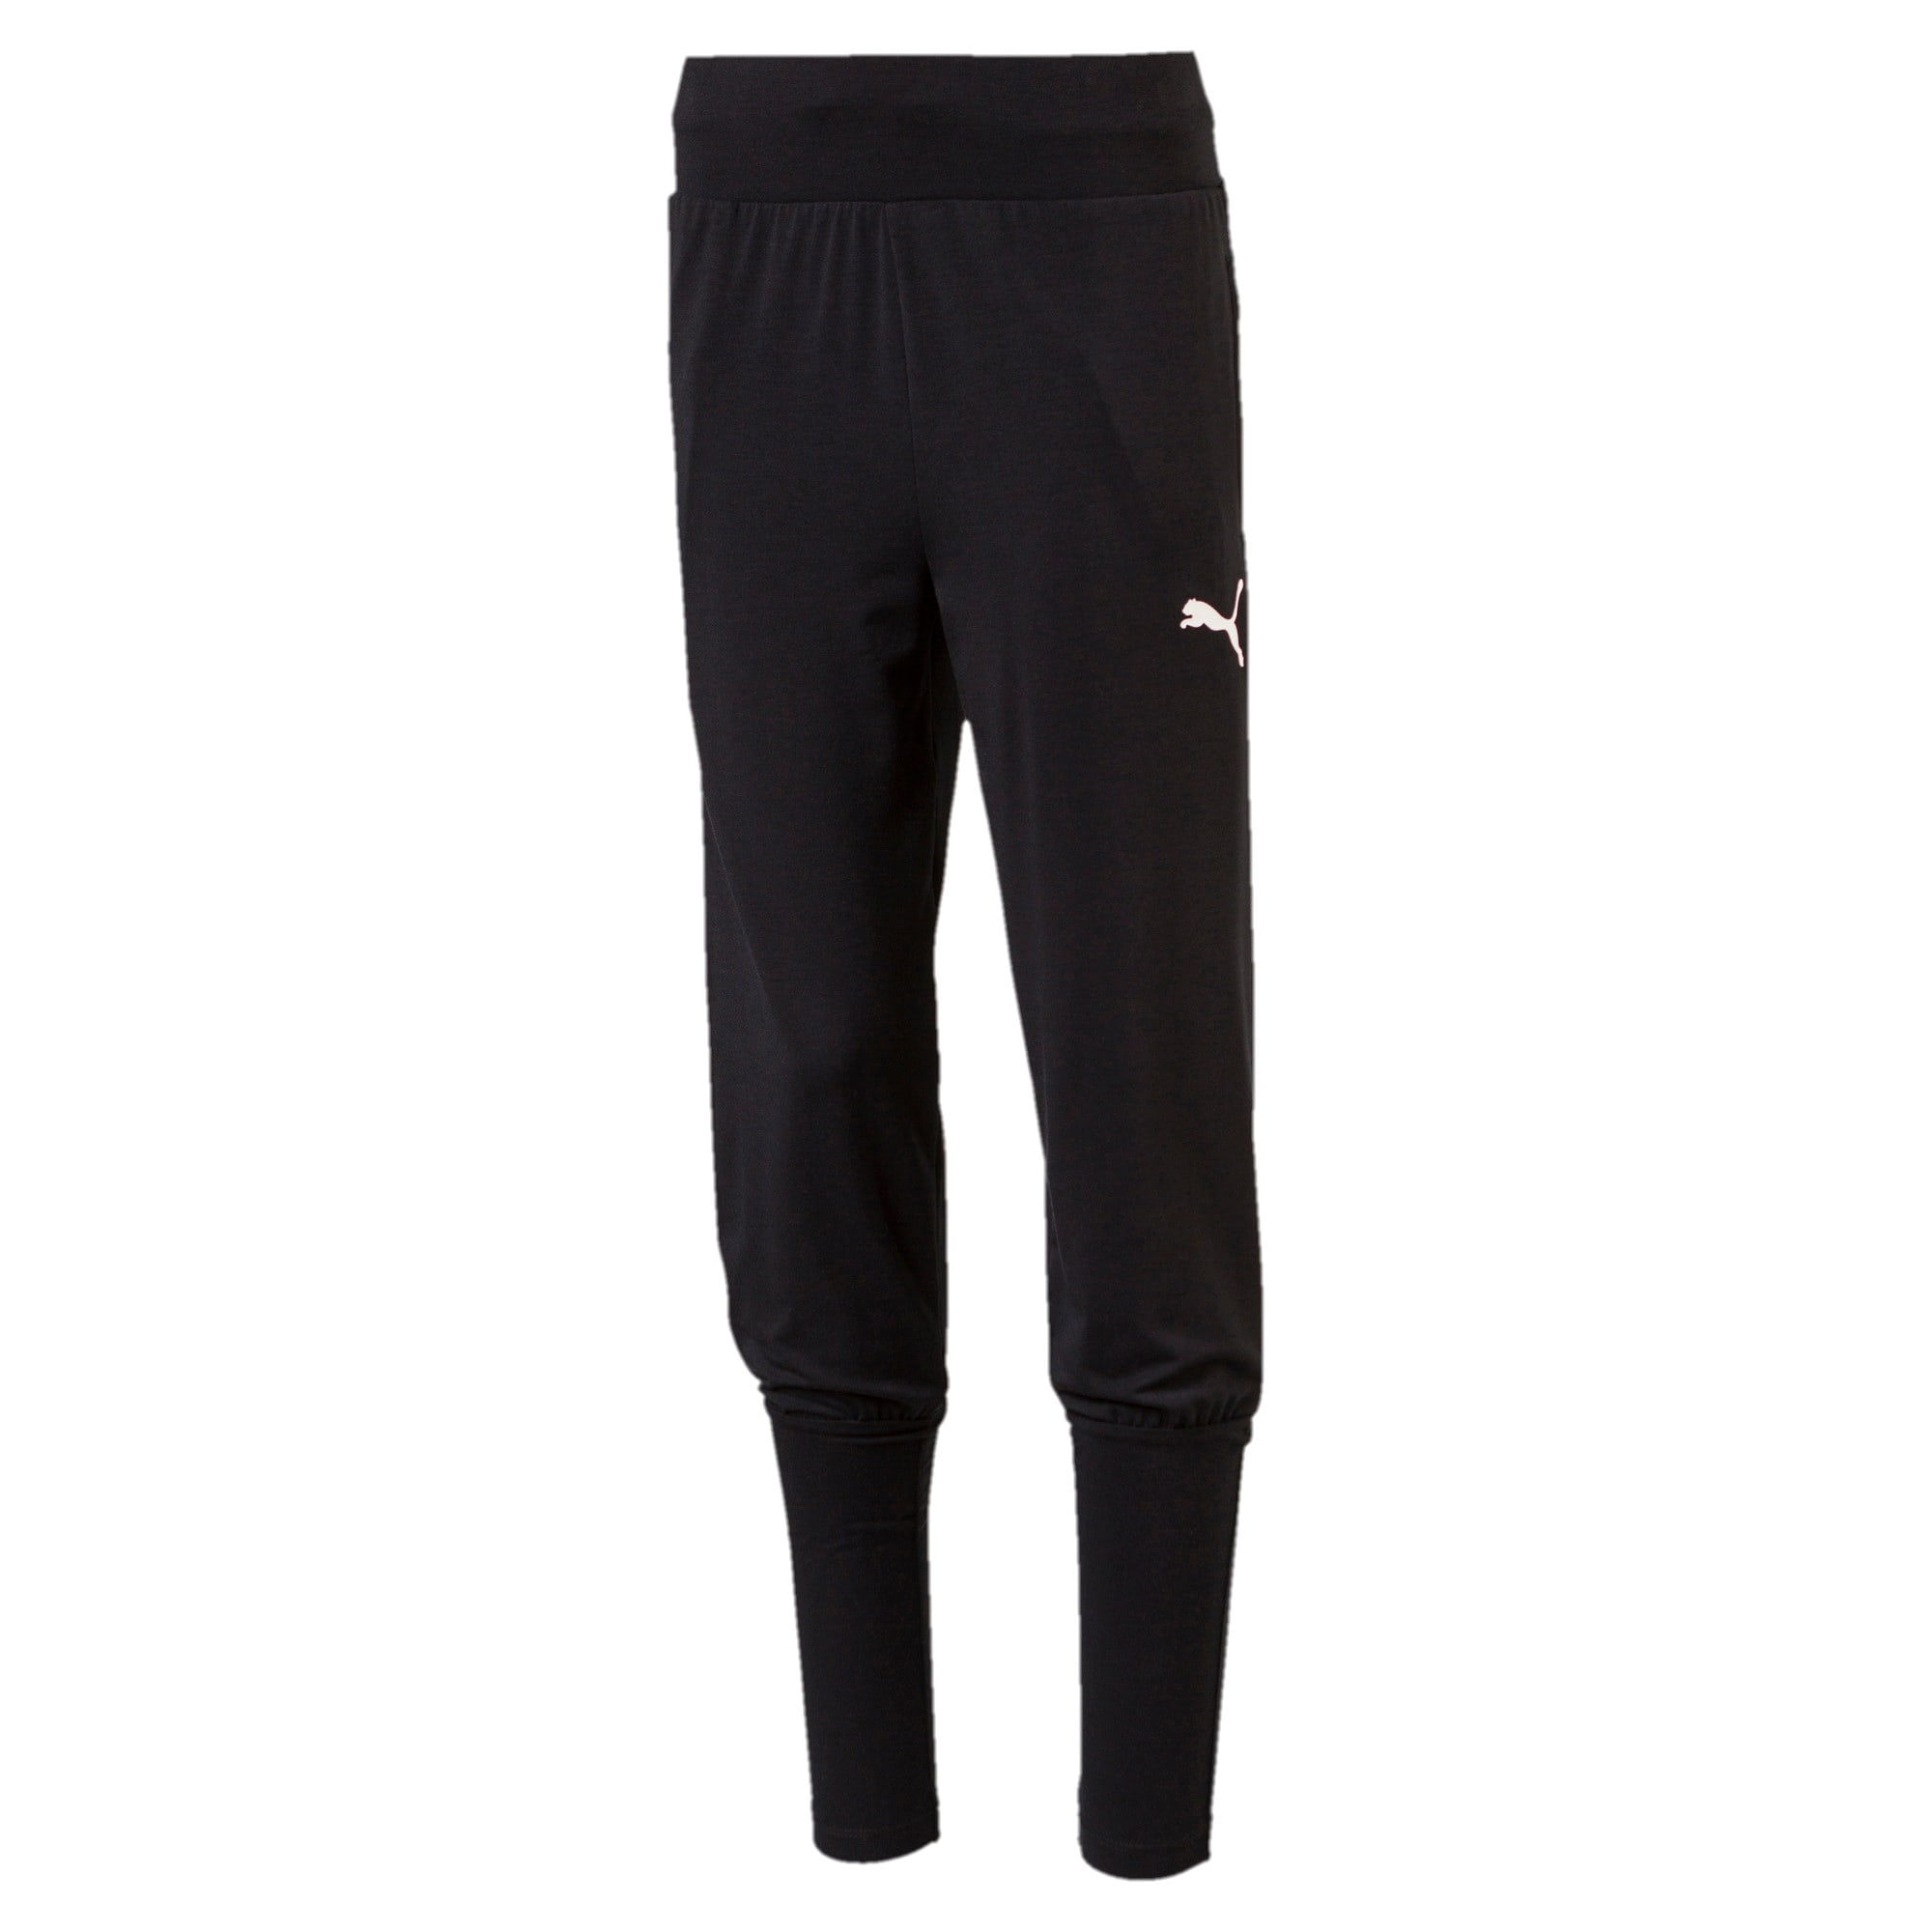 Thumbnail 1 of Girls' Softsport Jersey Pants, Puma Black, medium-IND